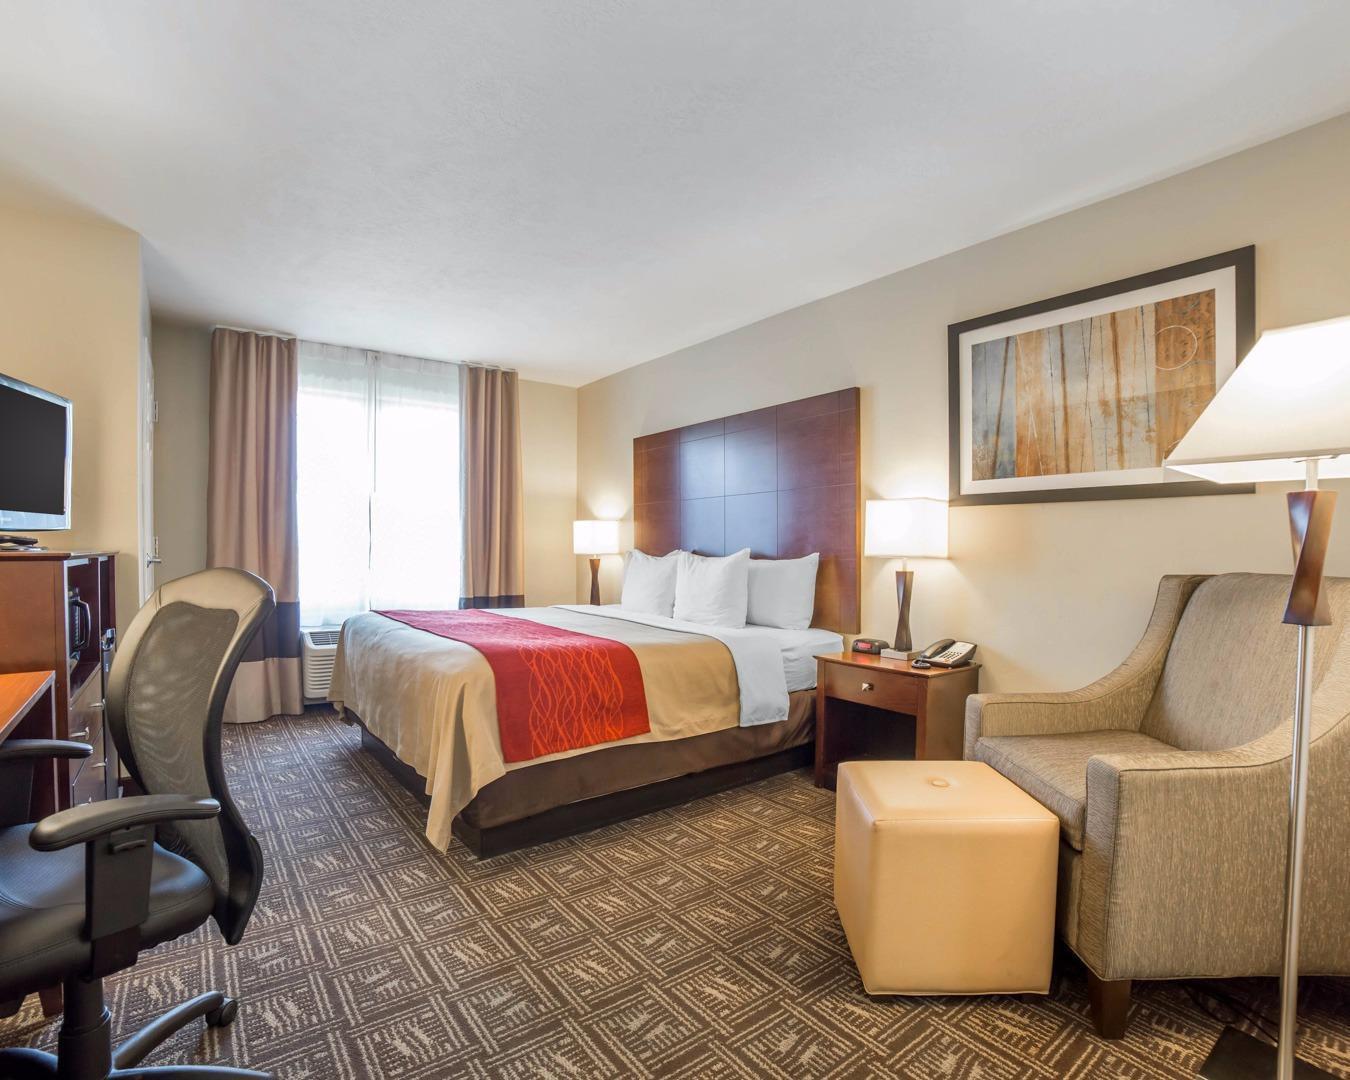 Comfort Inn & Suites, Tooele UT